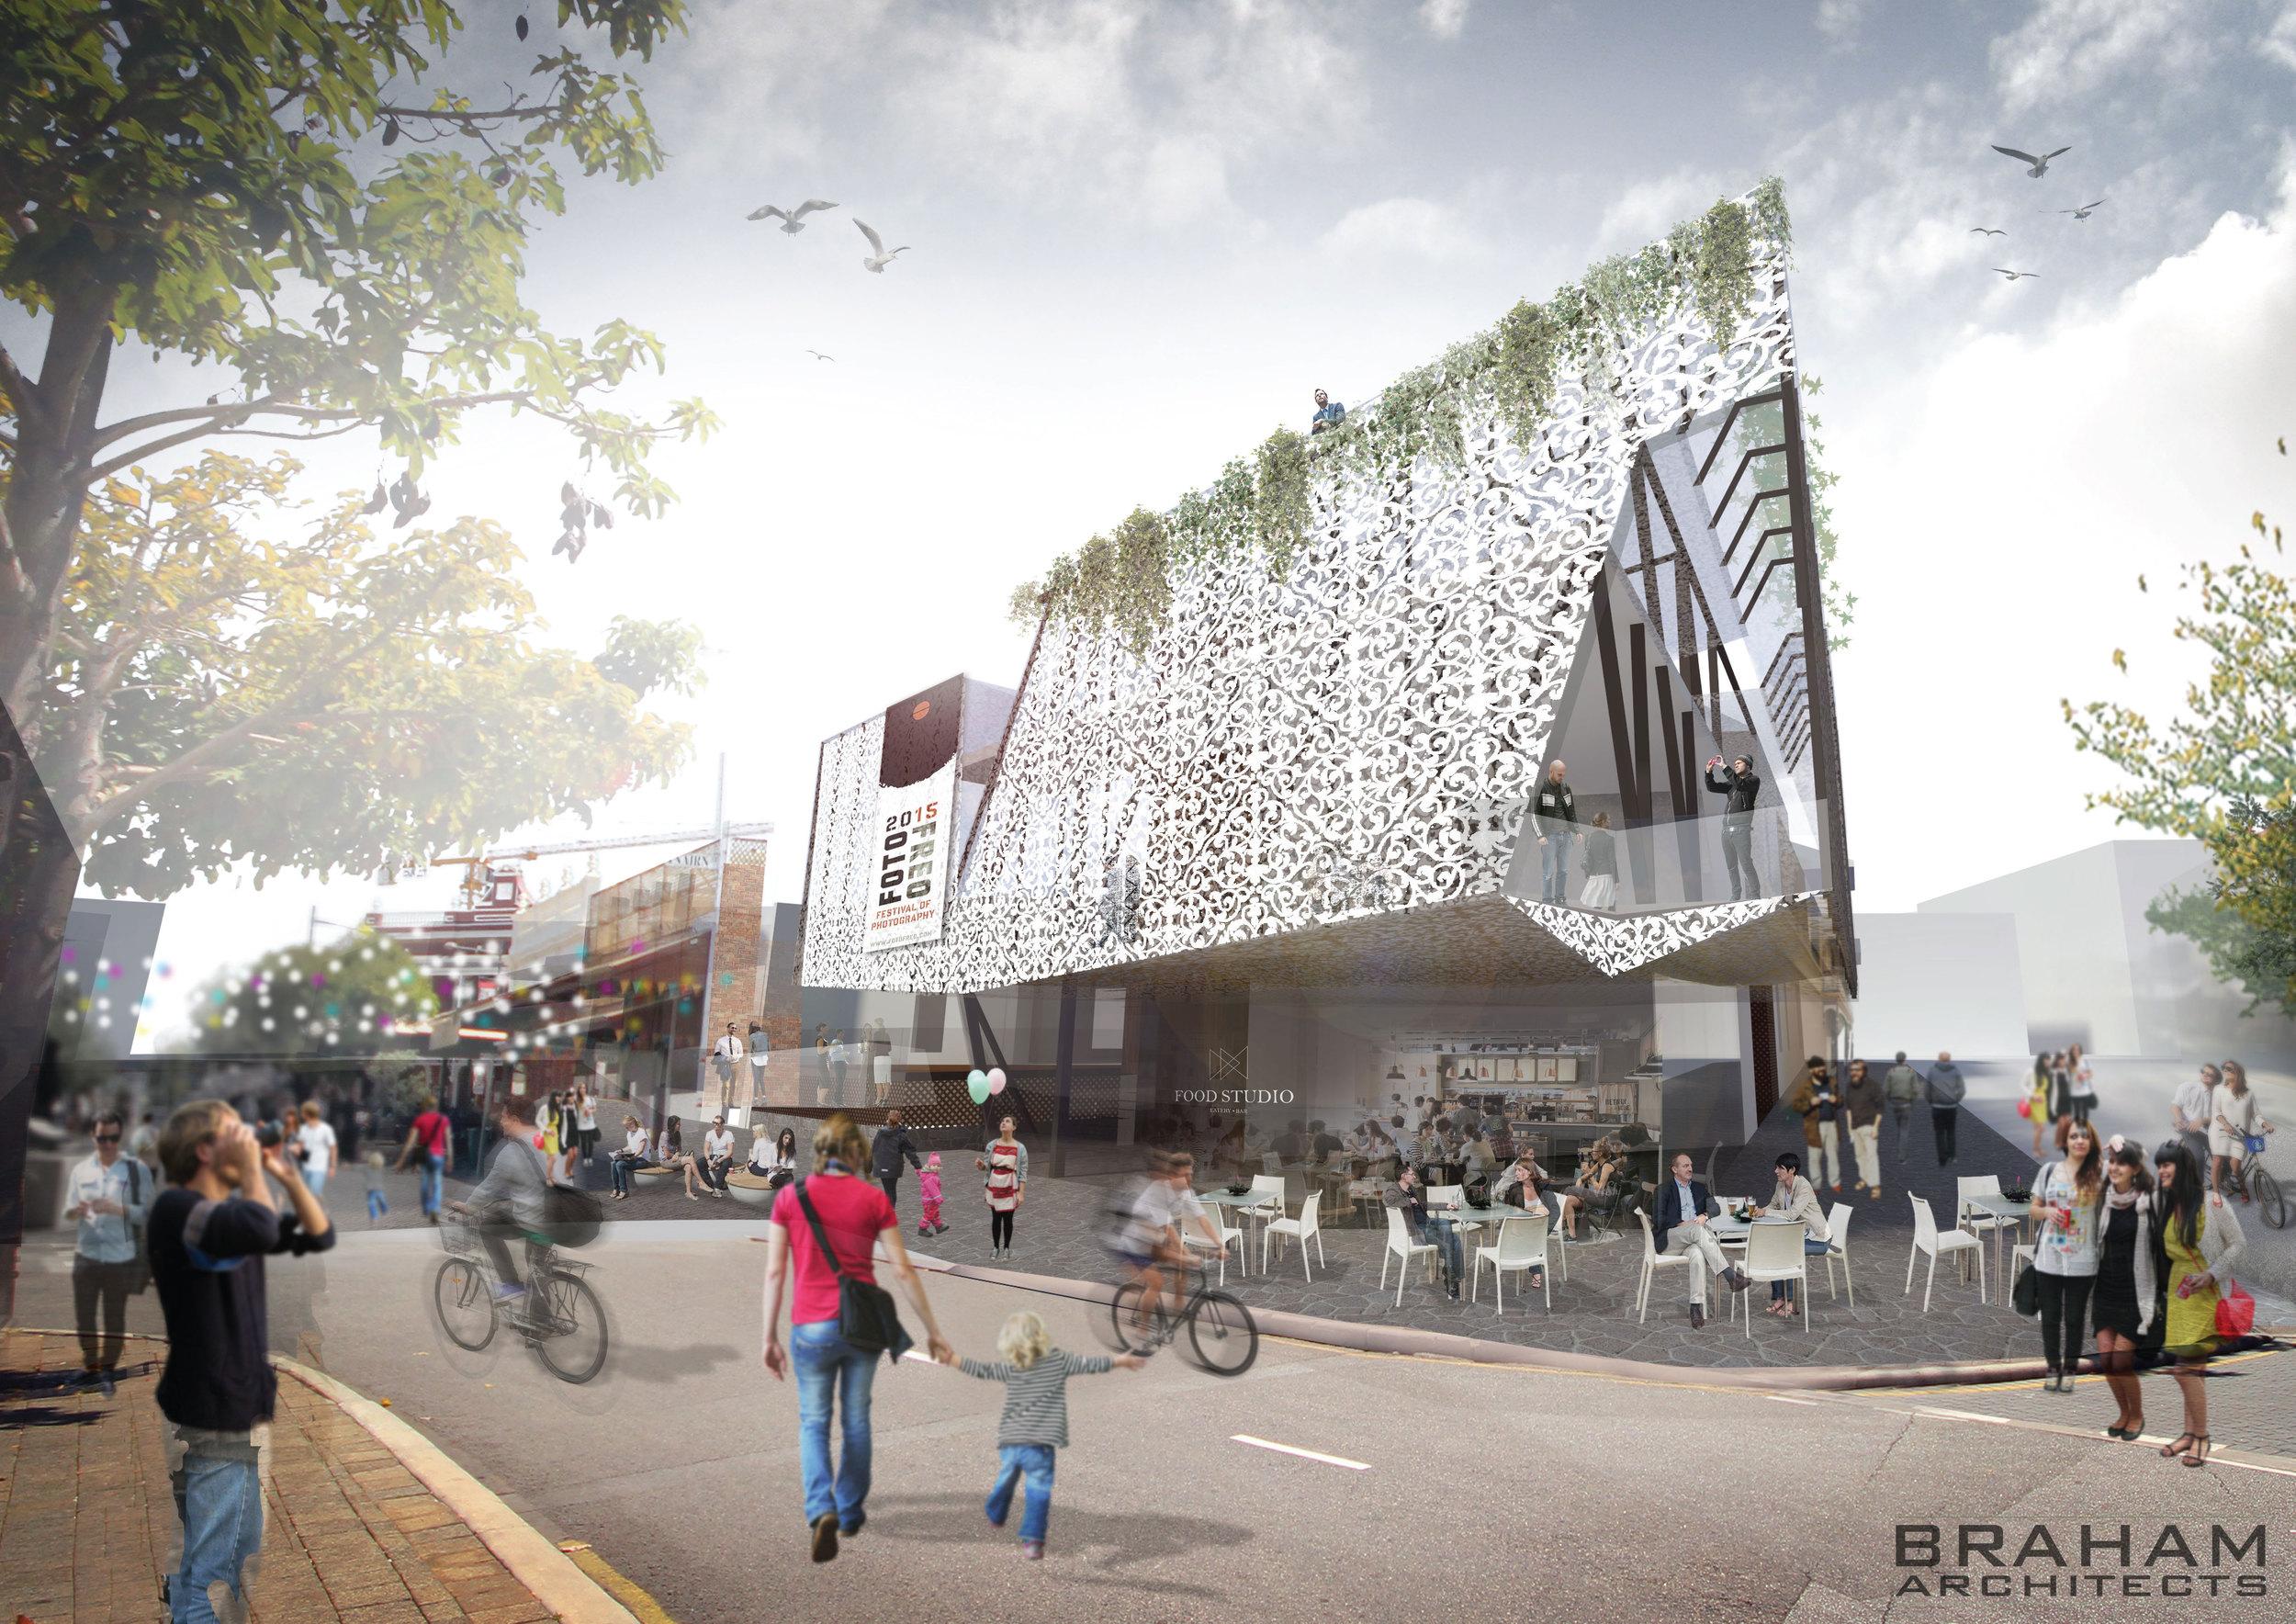 Braham-Architects-EvanDavies-CornerRender.jpg